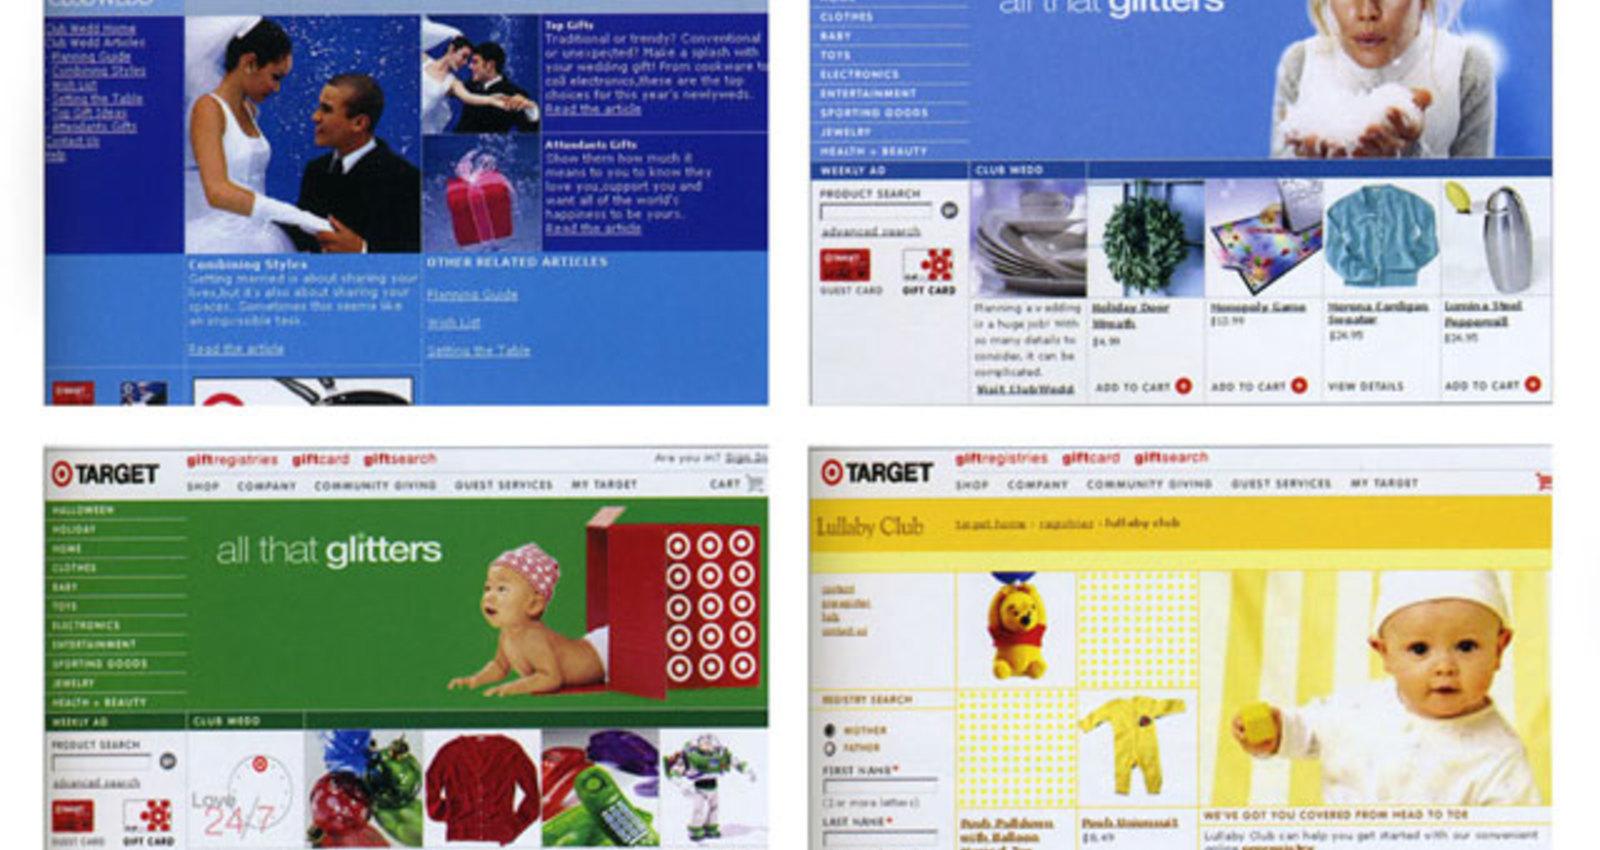 Target Web Site